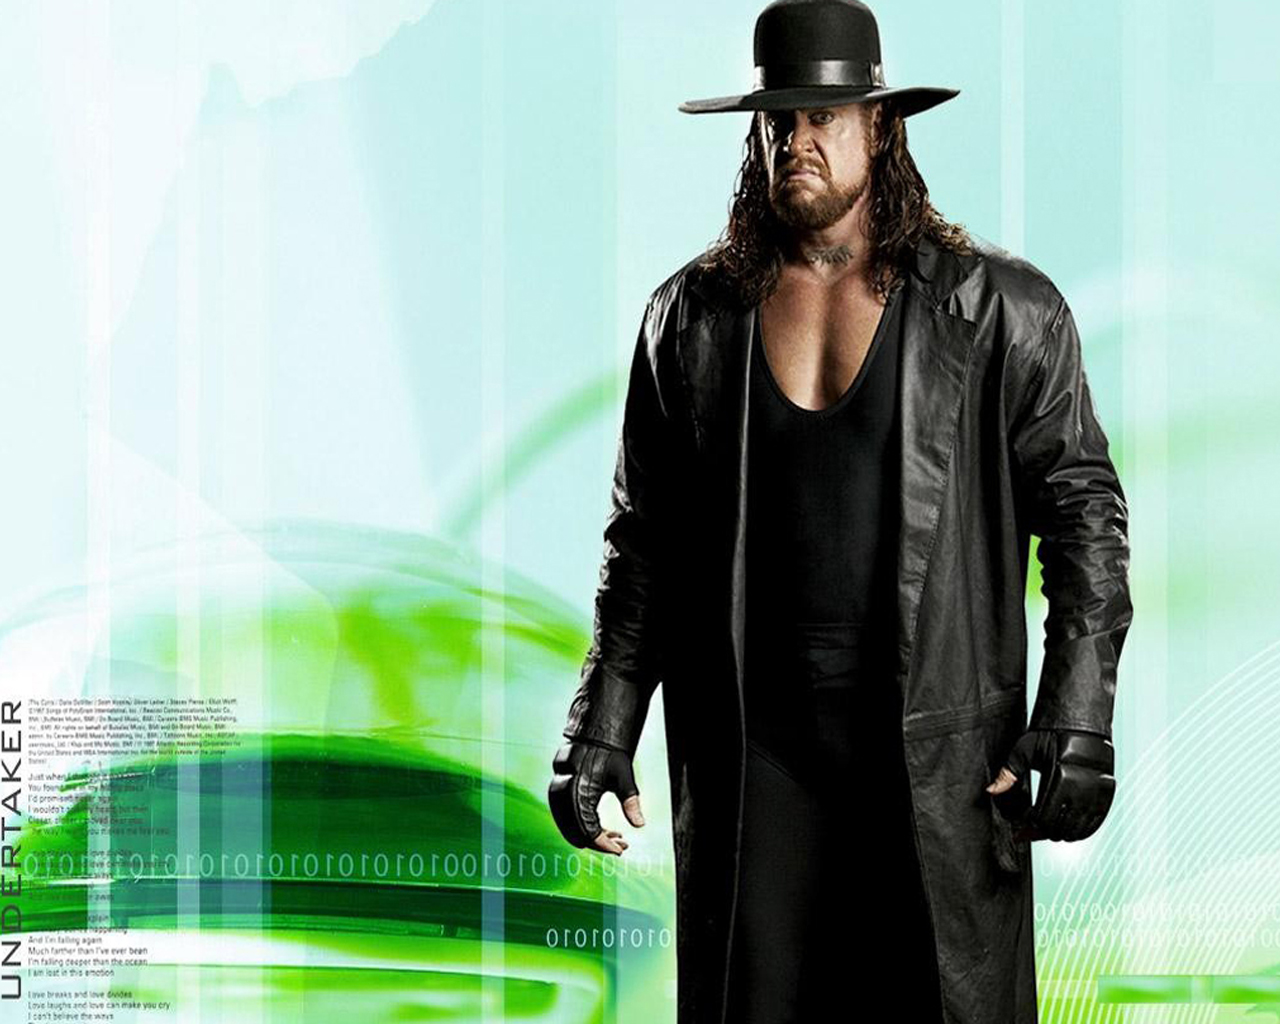 Undertaker 2012 WallpaperUndertaker Wallpaper 2012